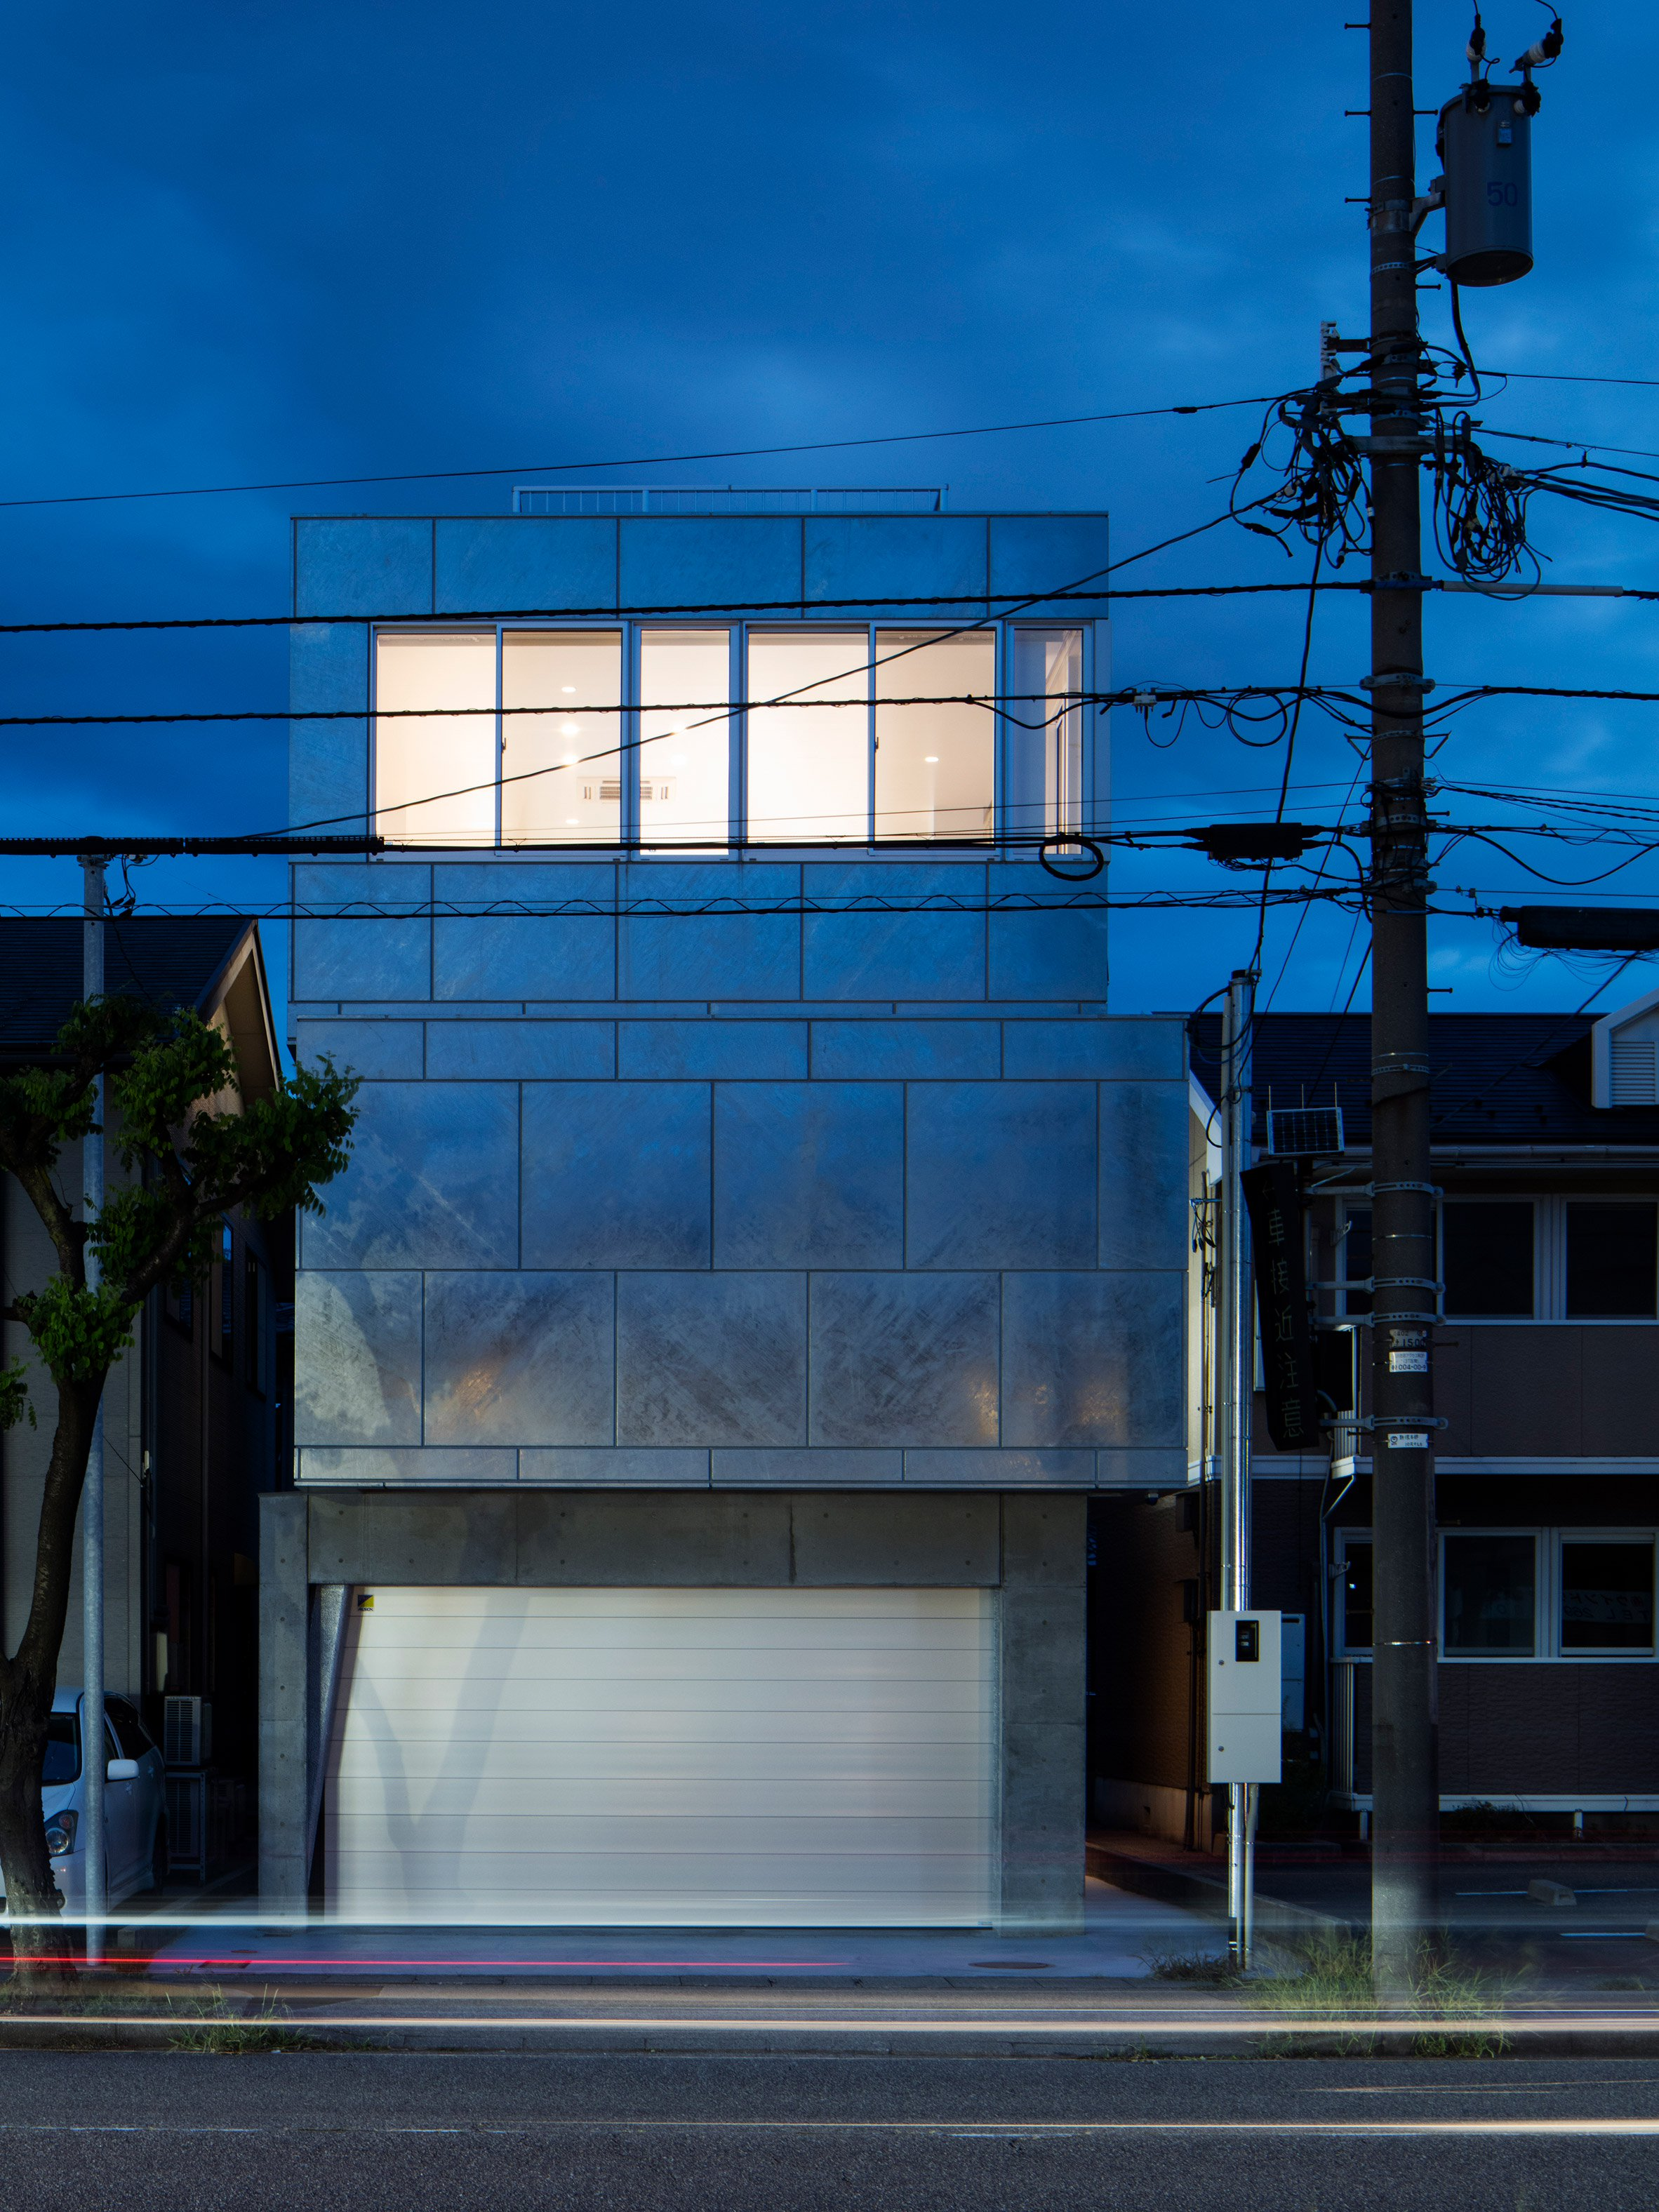 shinbohon-house-k-yuichi-yoshida-associates-architecture-residential-japan-_dezeen_2364_col_18.jpg